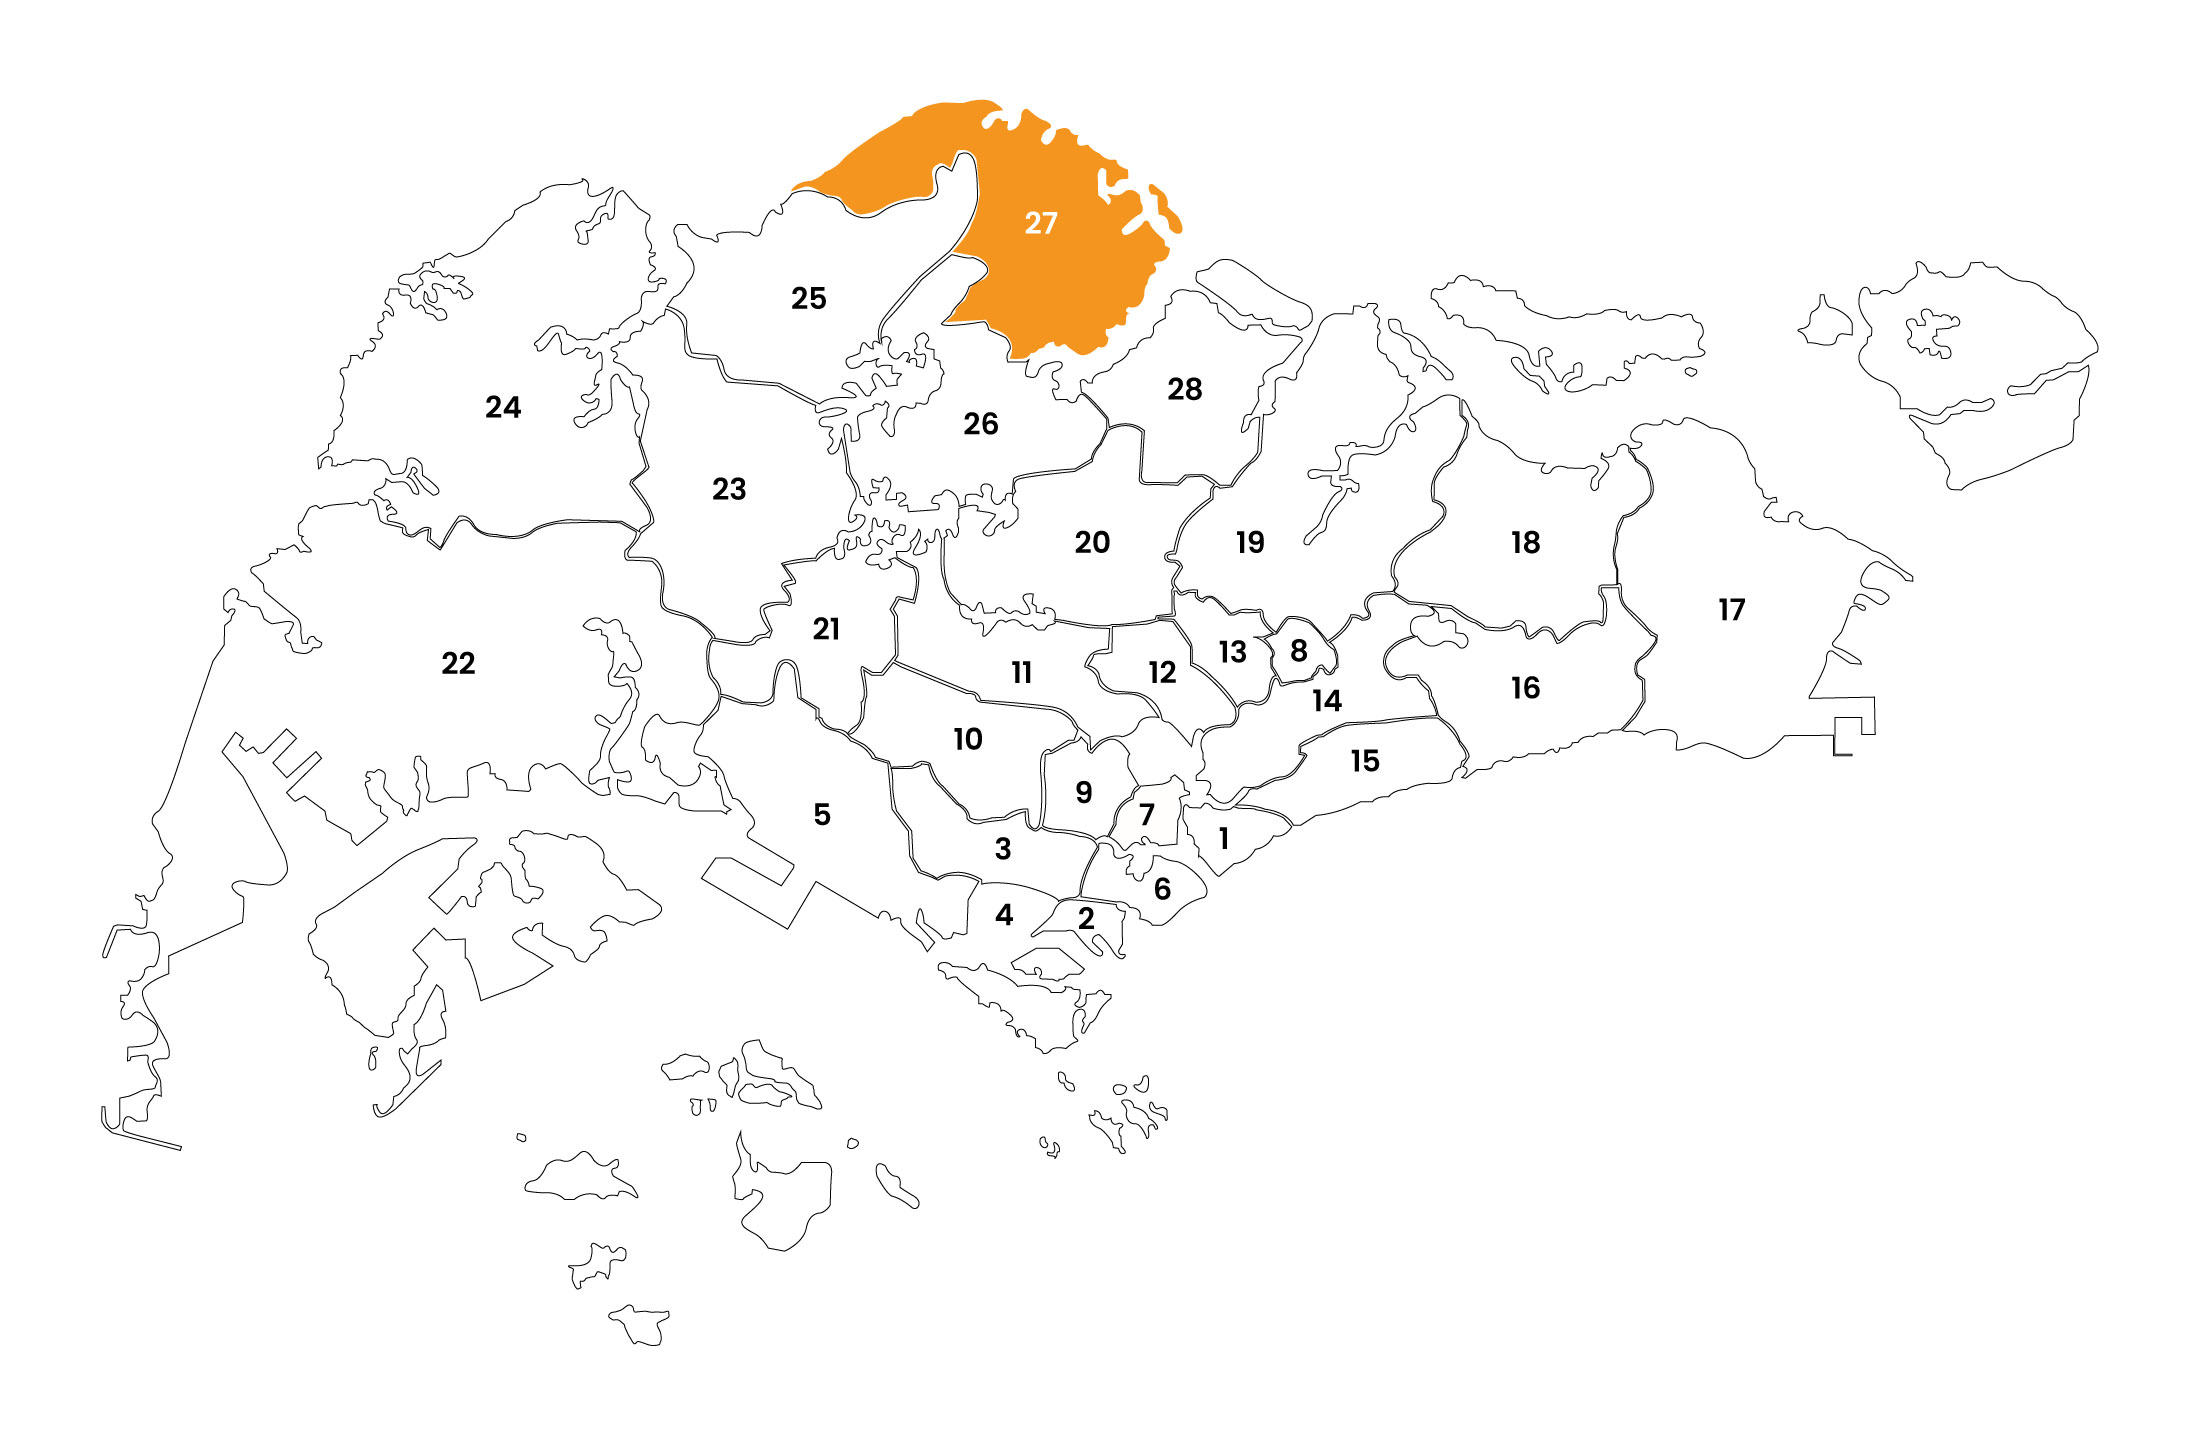 District 27: